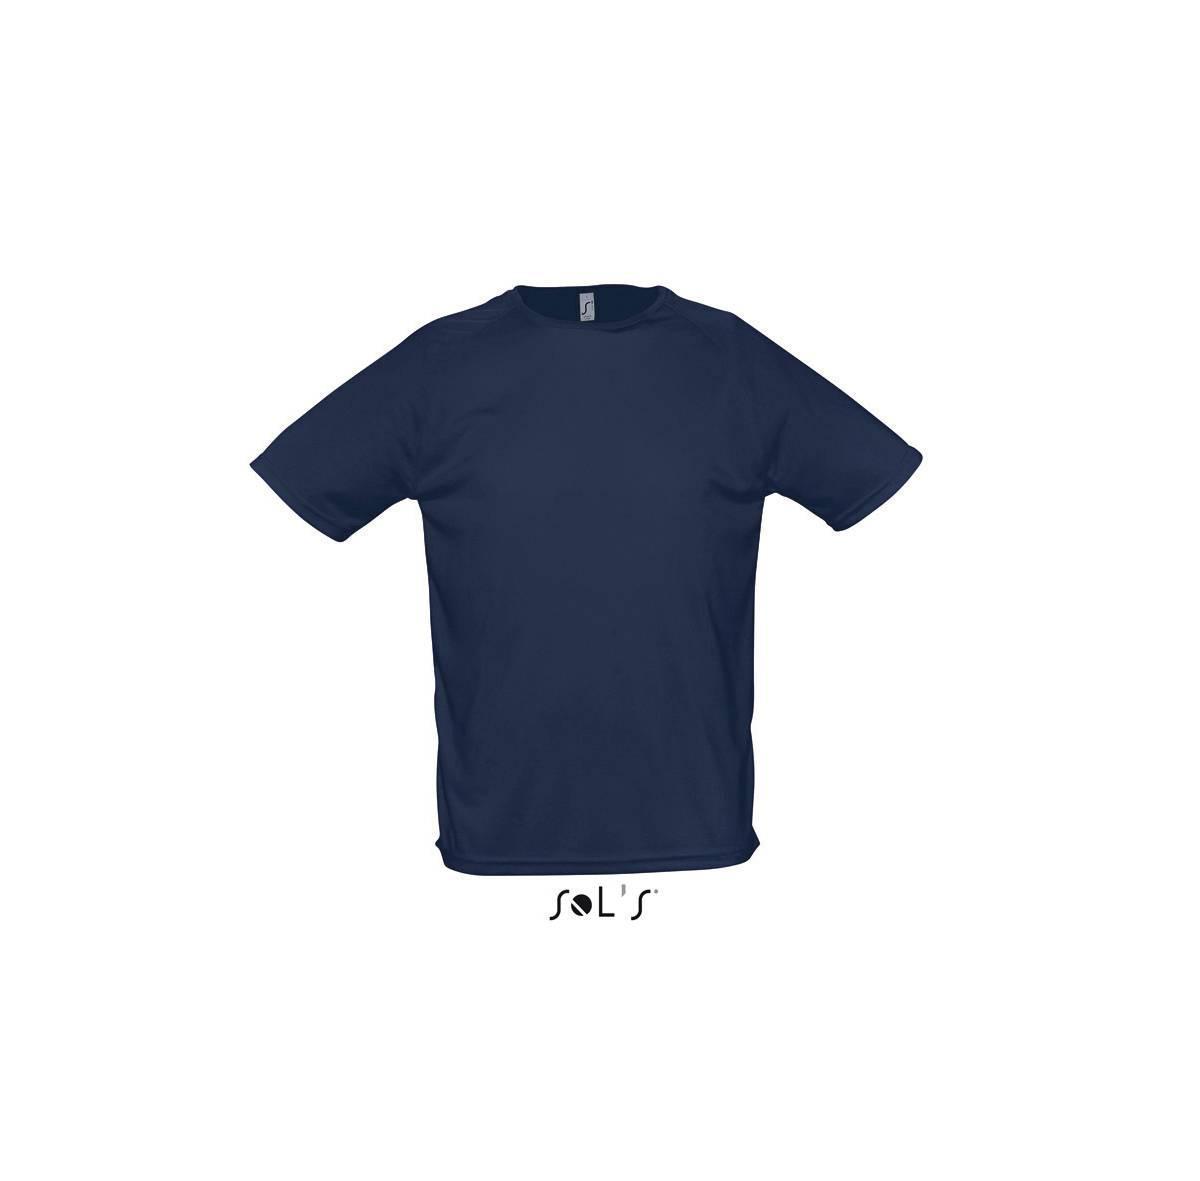 Футболка Sporty мужская, размер XL, цвет темно-синий